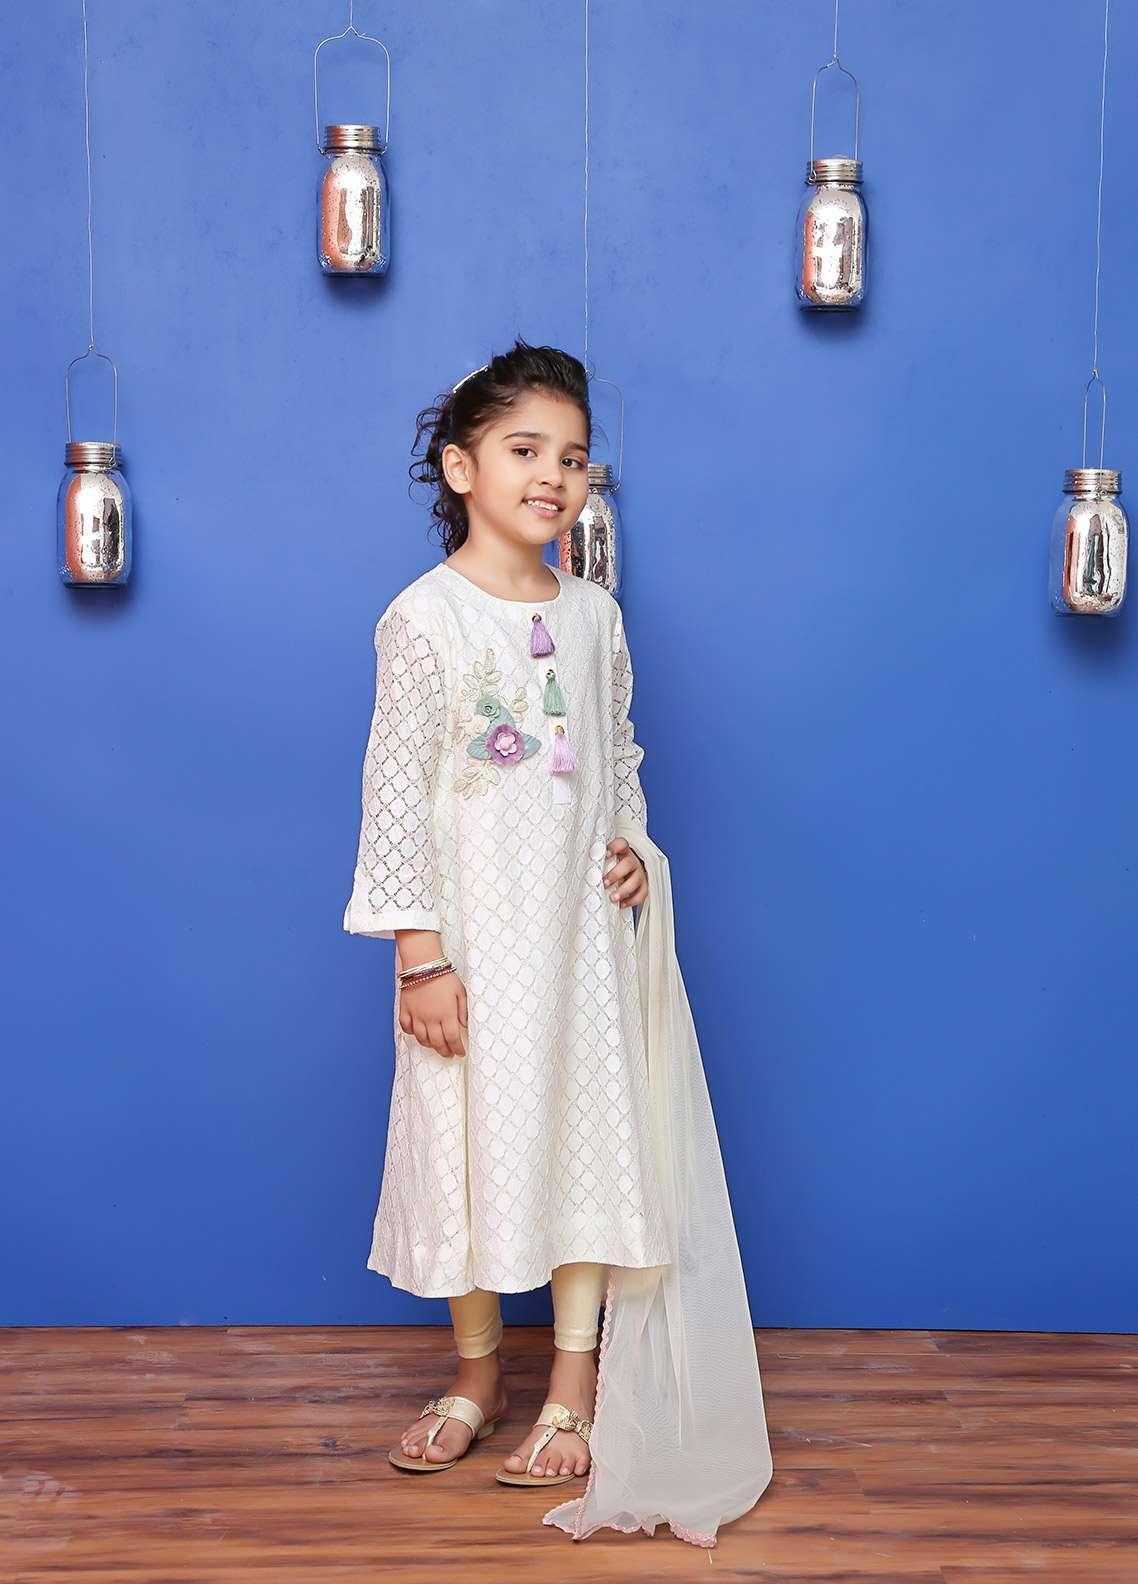 Ochre Cotton Net Formal Girls 2 Piece Suit -  OFW 168 Off White